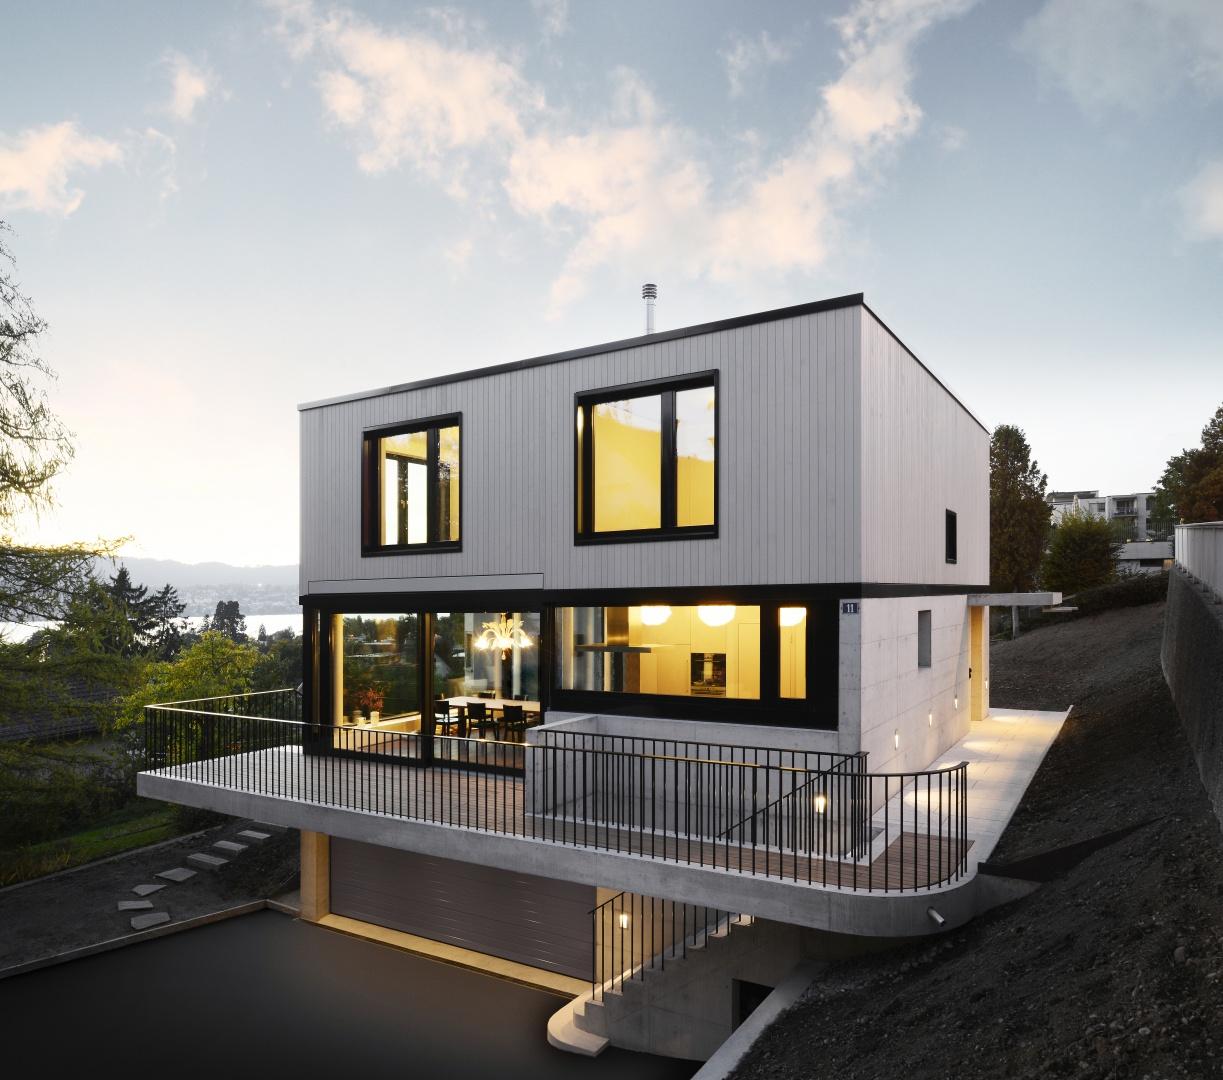 Neubau einfamilienhaus documentation suisse du batiment for Pramierte einfamilienhauser